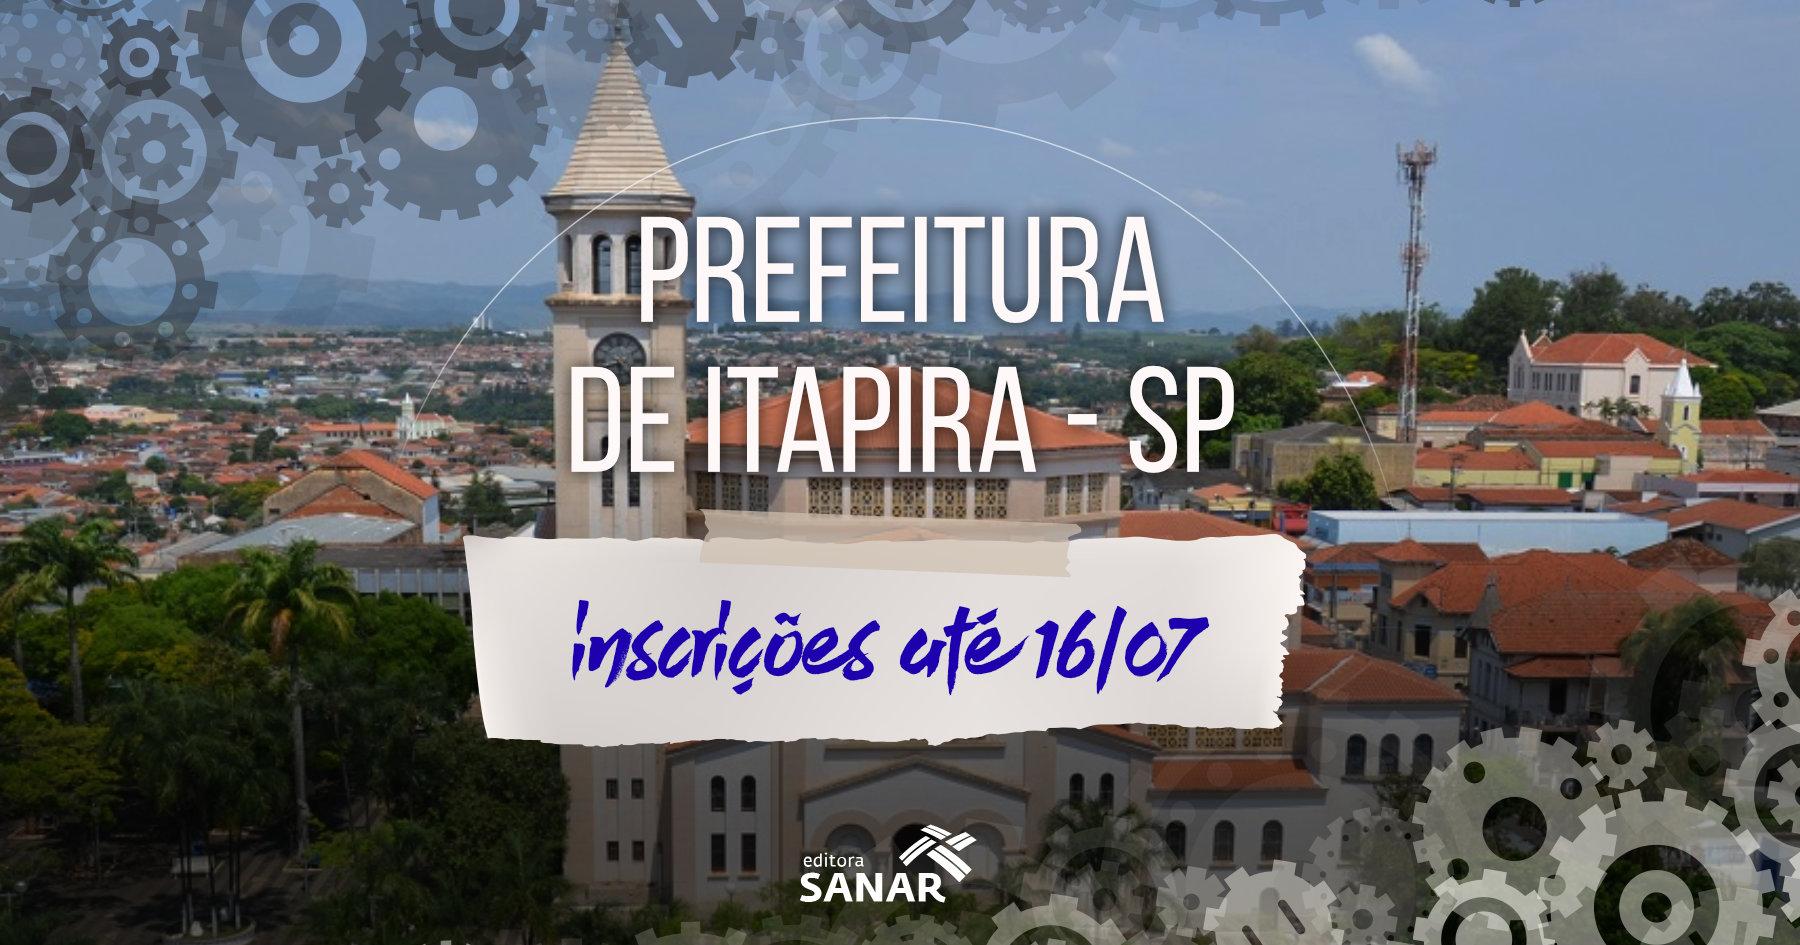 Concurso Público: Prefeitura de Itapira (SP) tem vagas para Medicina